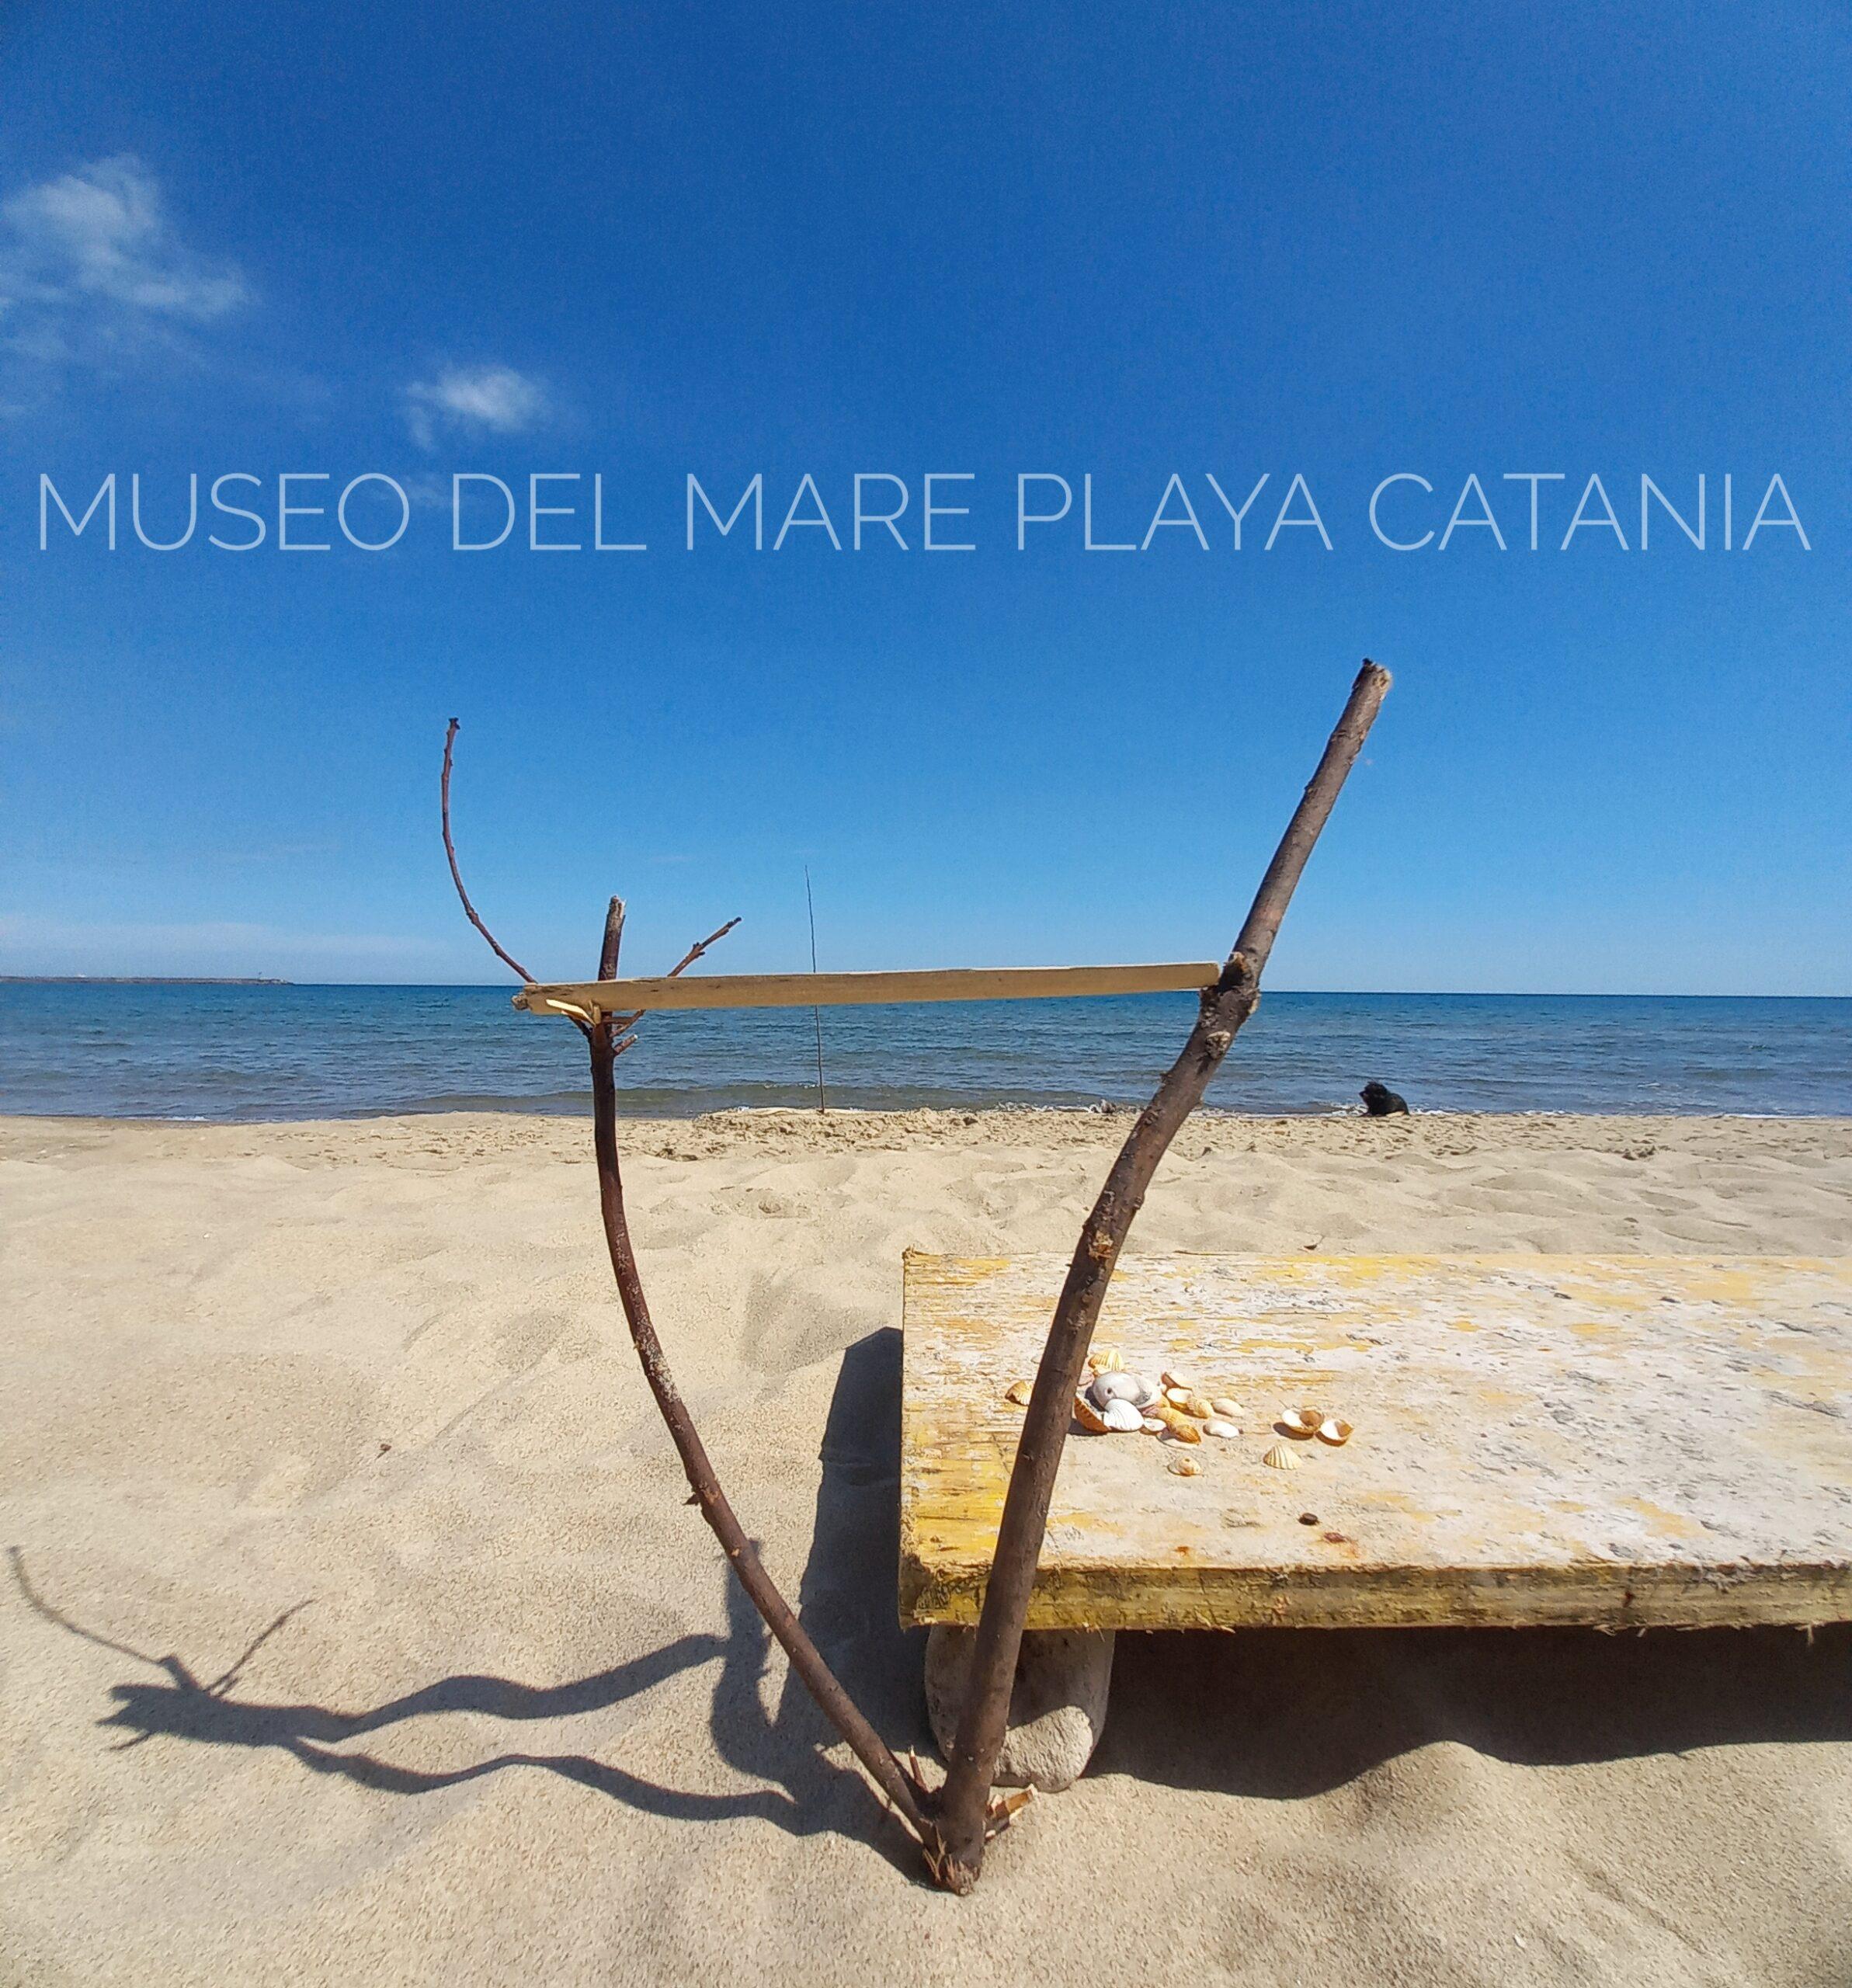 Museo del Mare Playa Catania